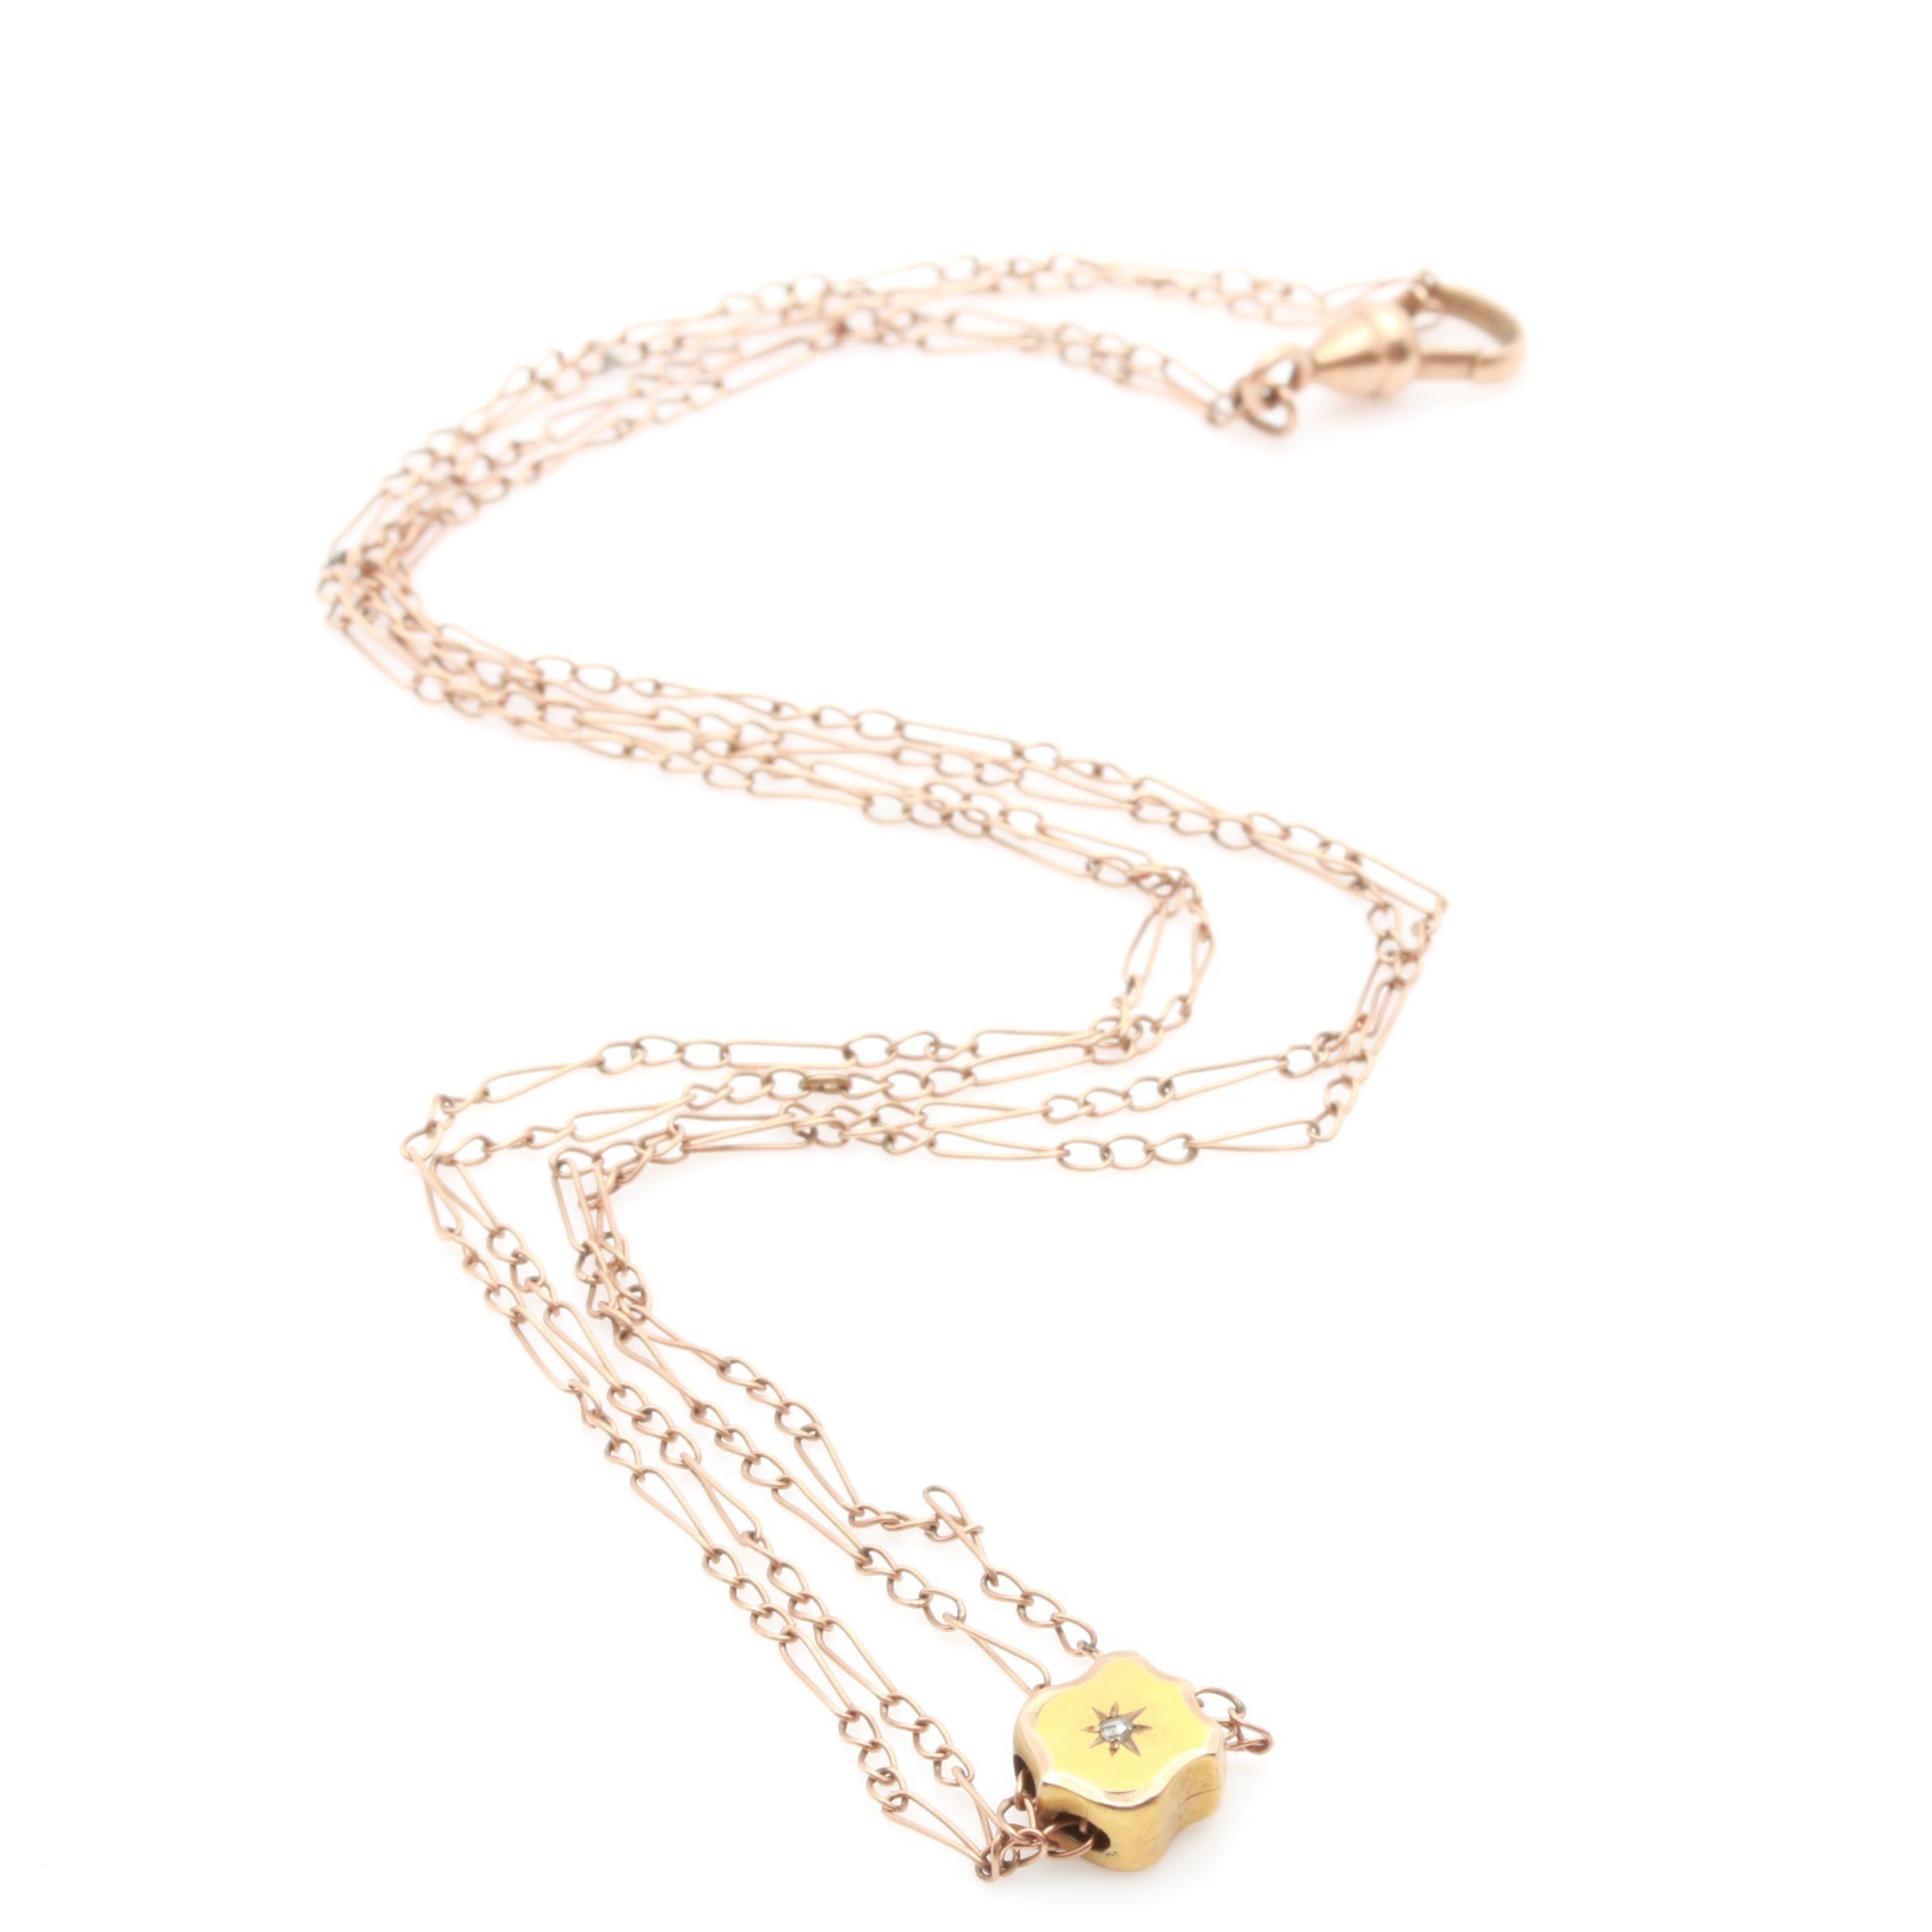 Victorian 10K Yellow Gold Diamond Sliding Watch Fob Necklace